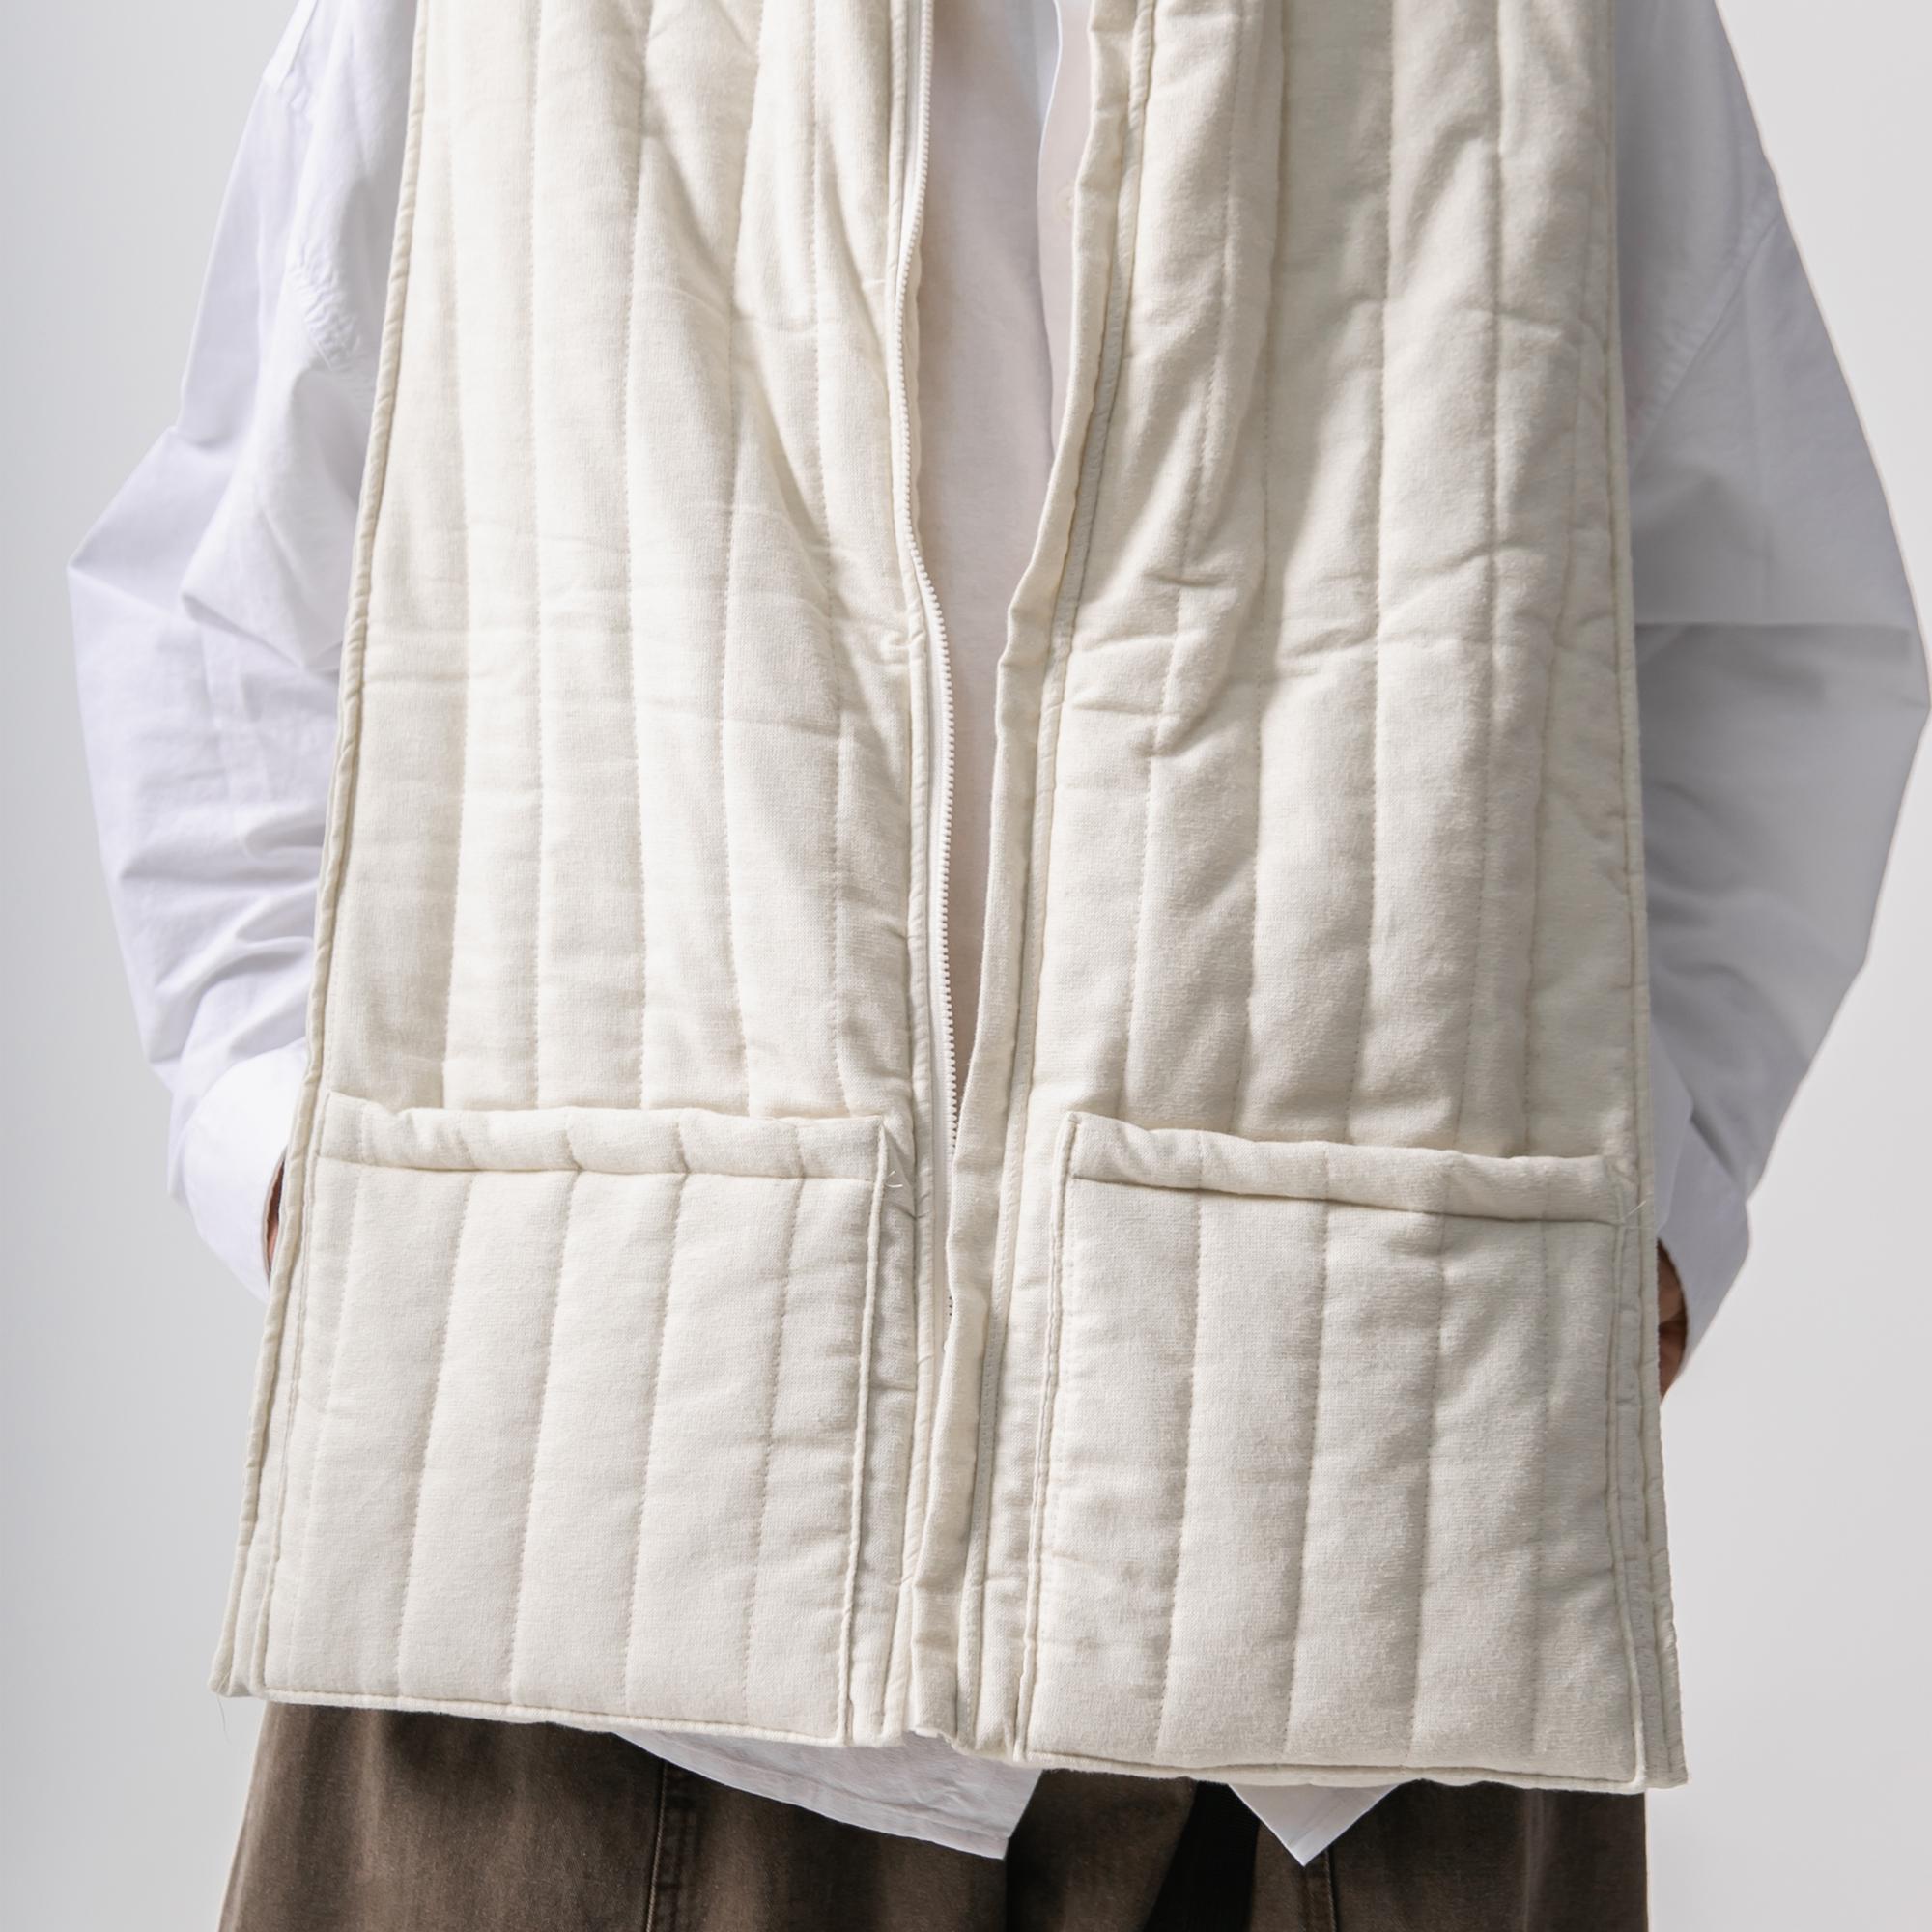 Opening Robe Padding Vest - Ivory